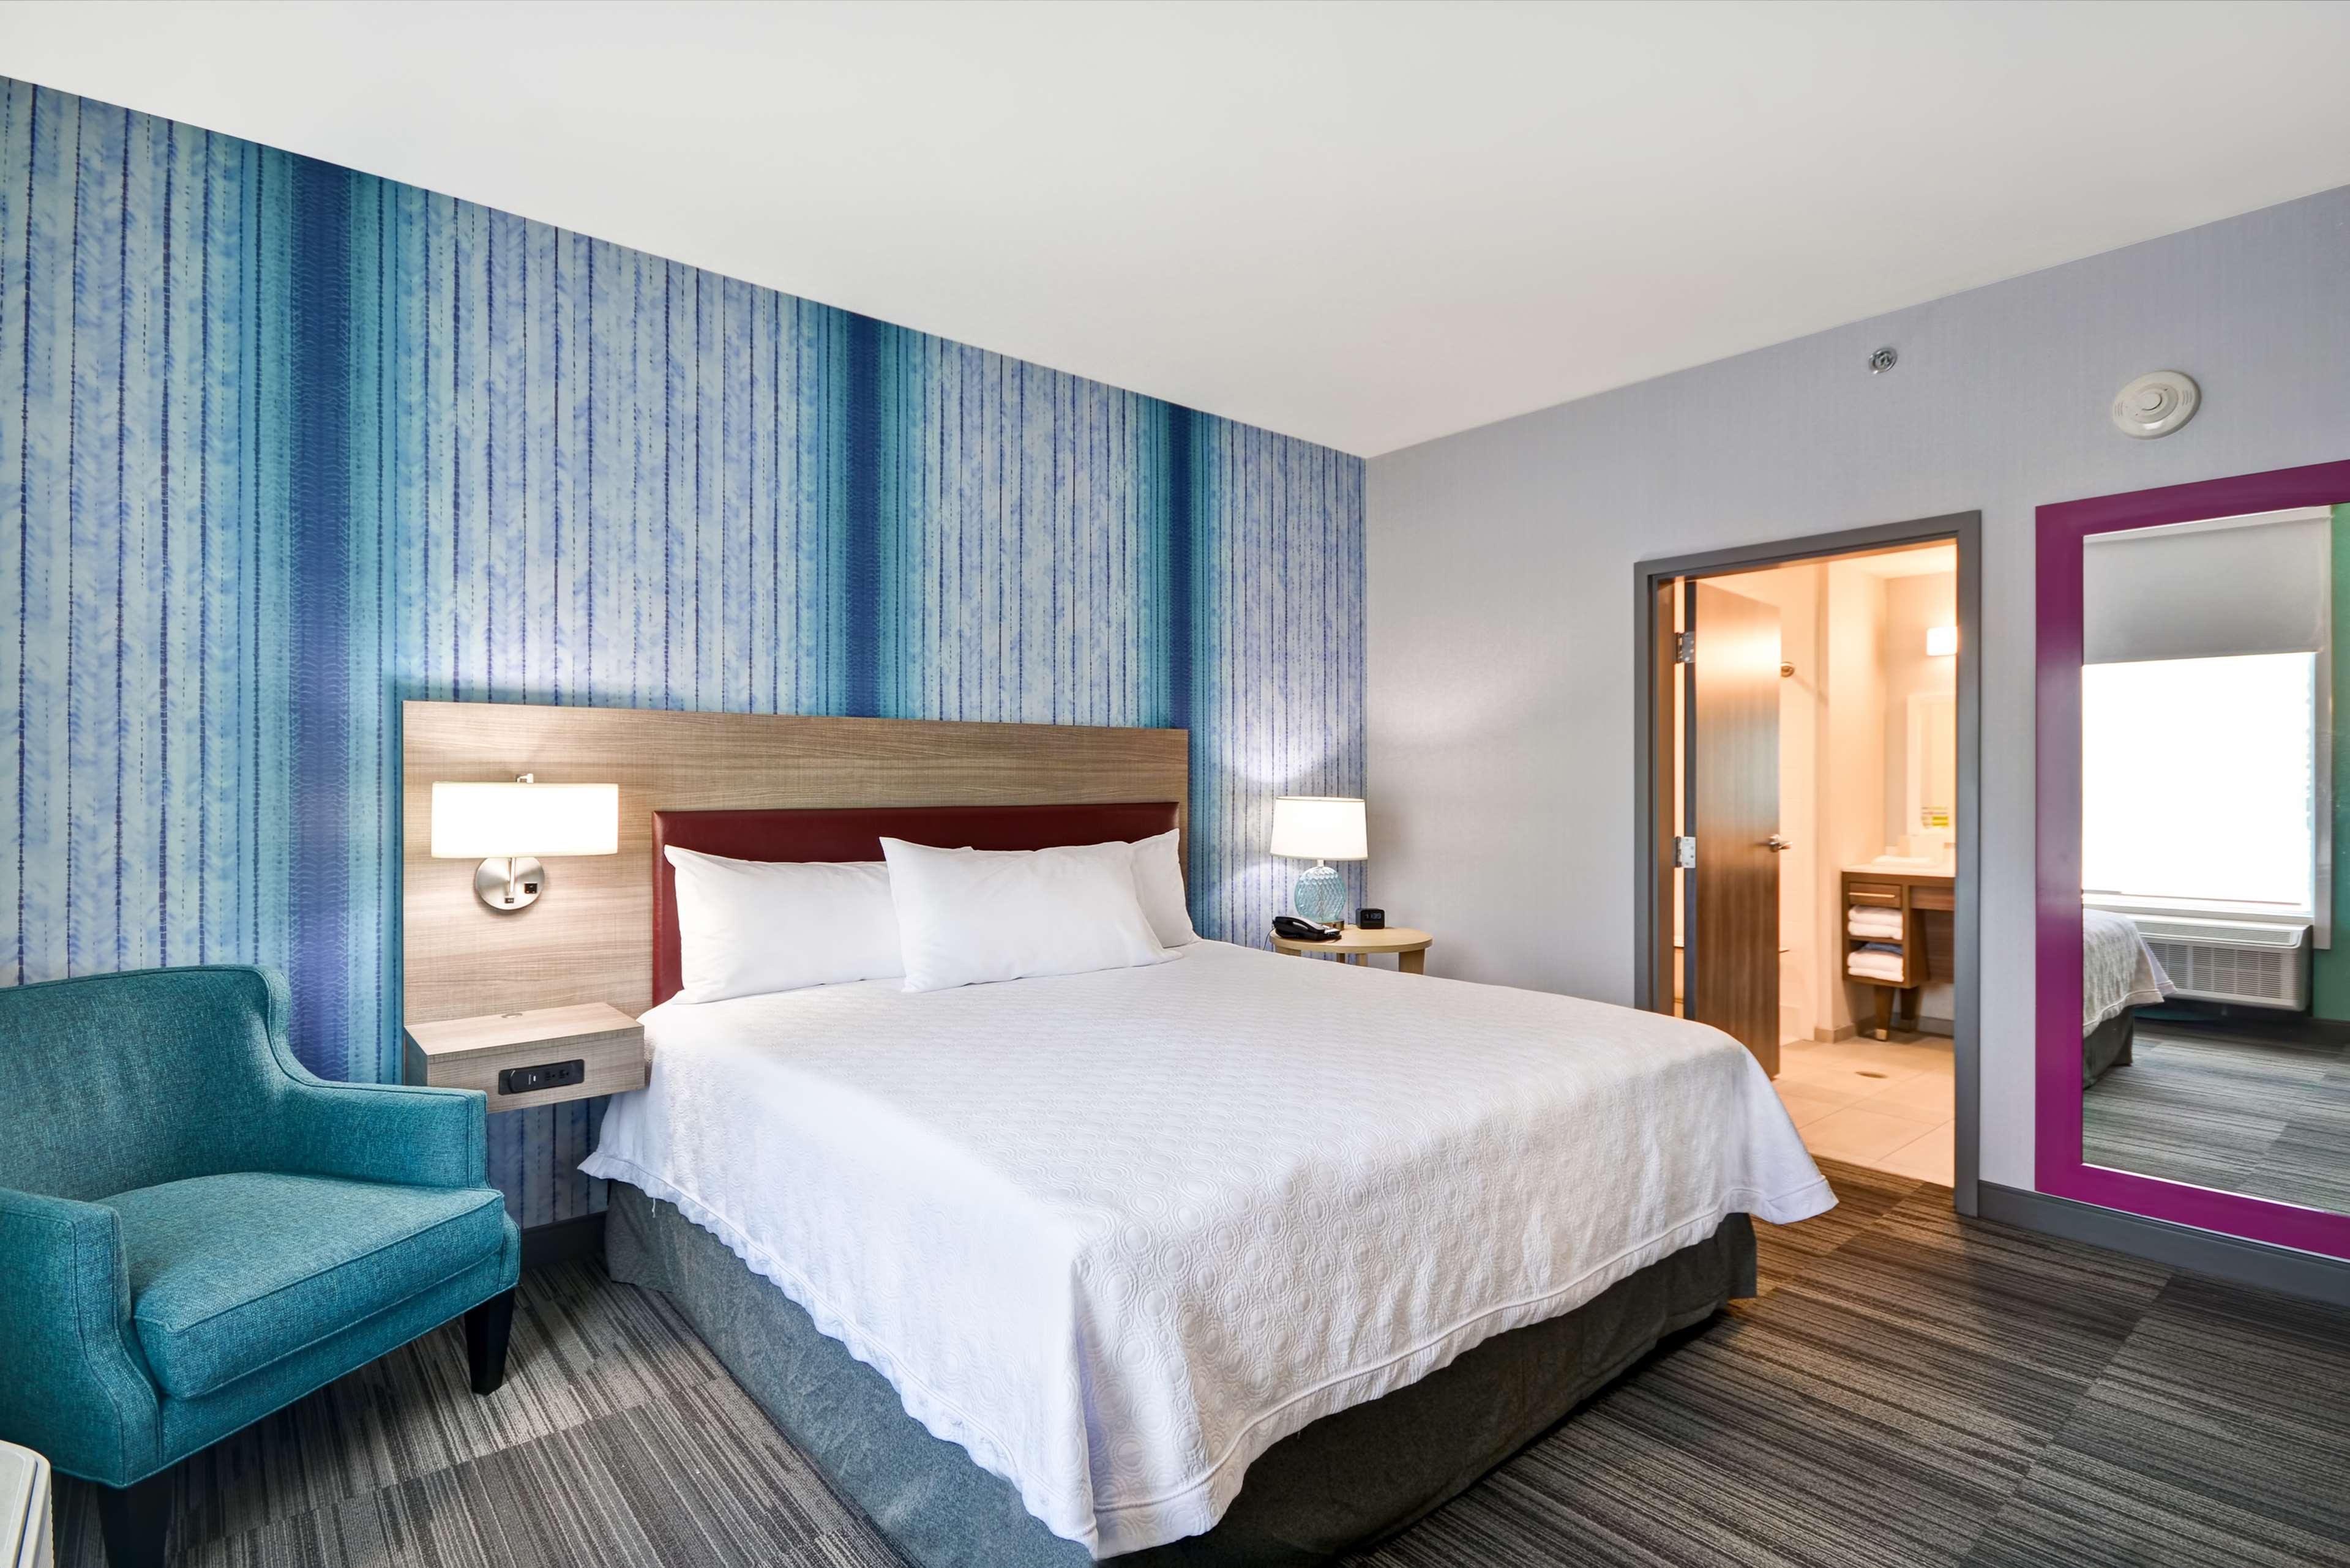 Home2 Suites by Hilton Atlanta West Lithia Springs image 30